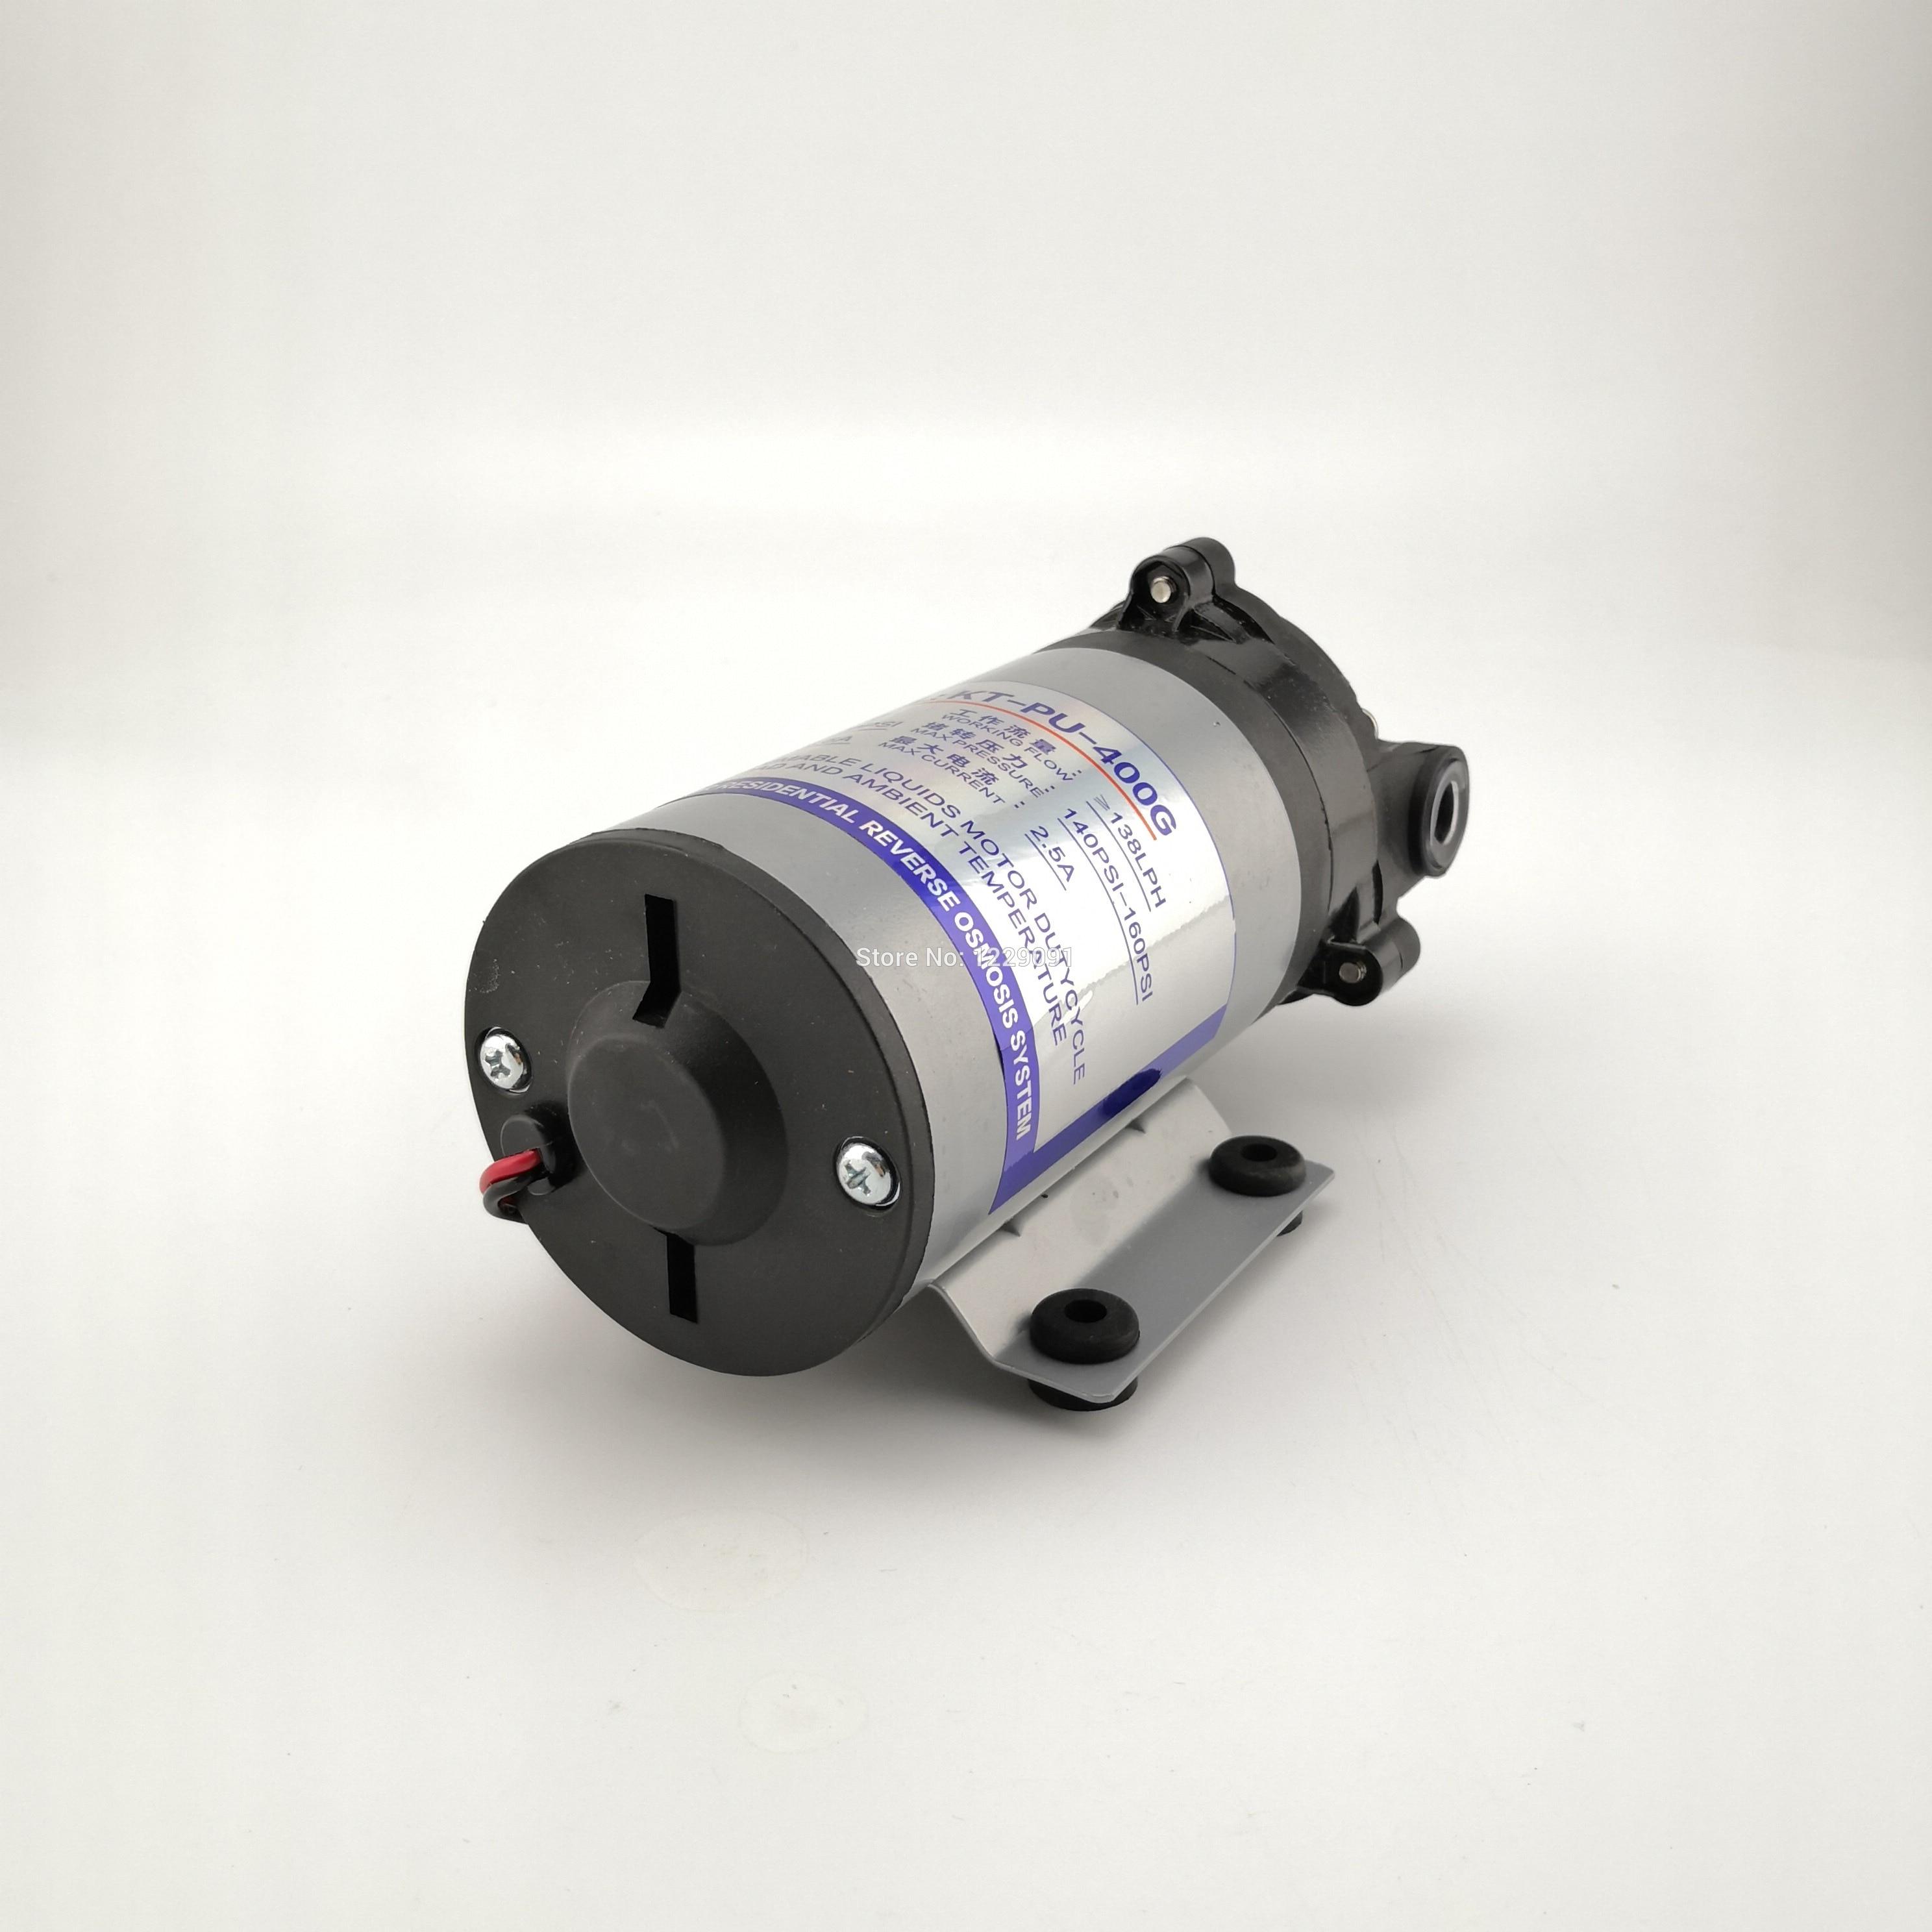 Nuotrilin 36v RO Booster water Pump Reverse Osmosis System Pressure Increase 400gpd 500gpd 800gpd G3/8 port